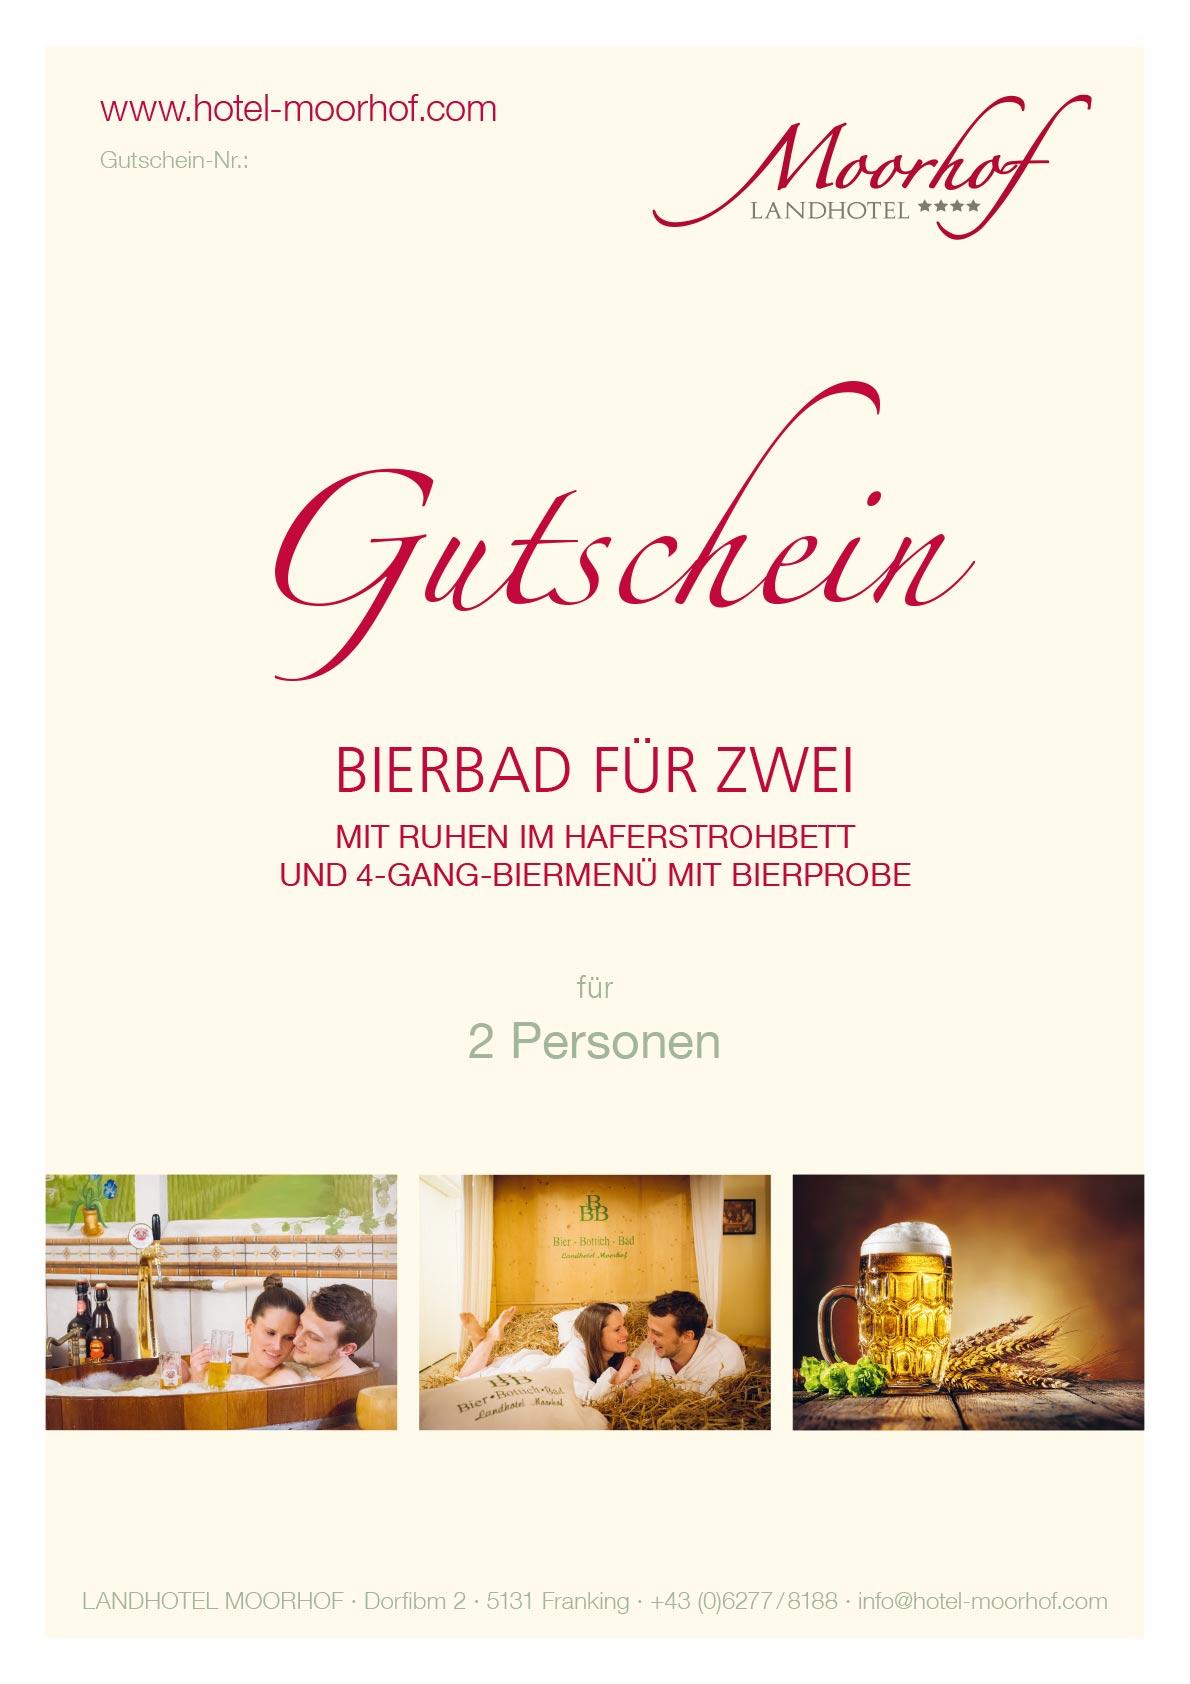 Gutschein-bierbad-4gang-2pers